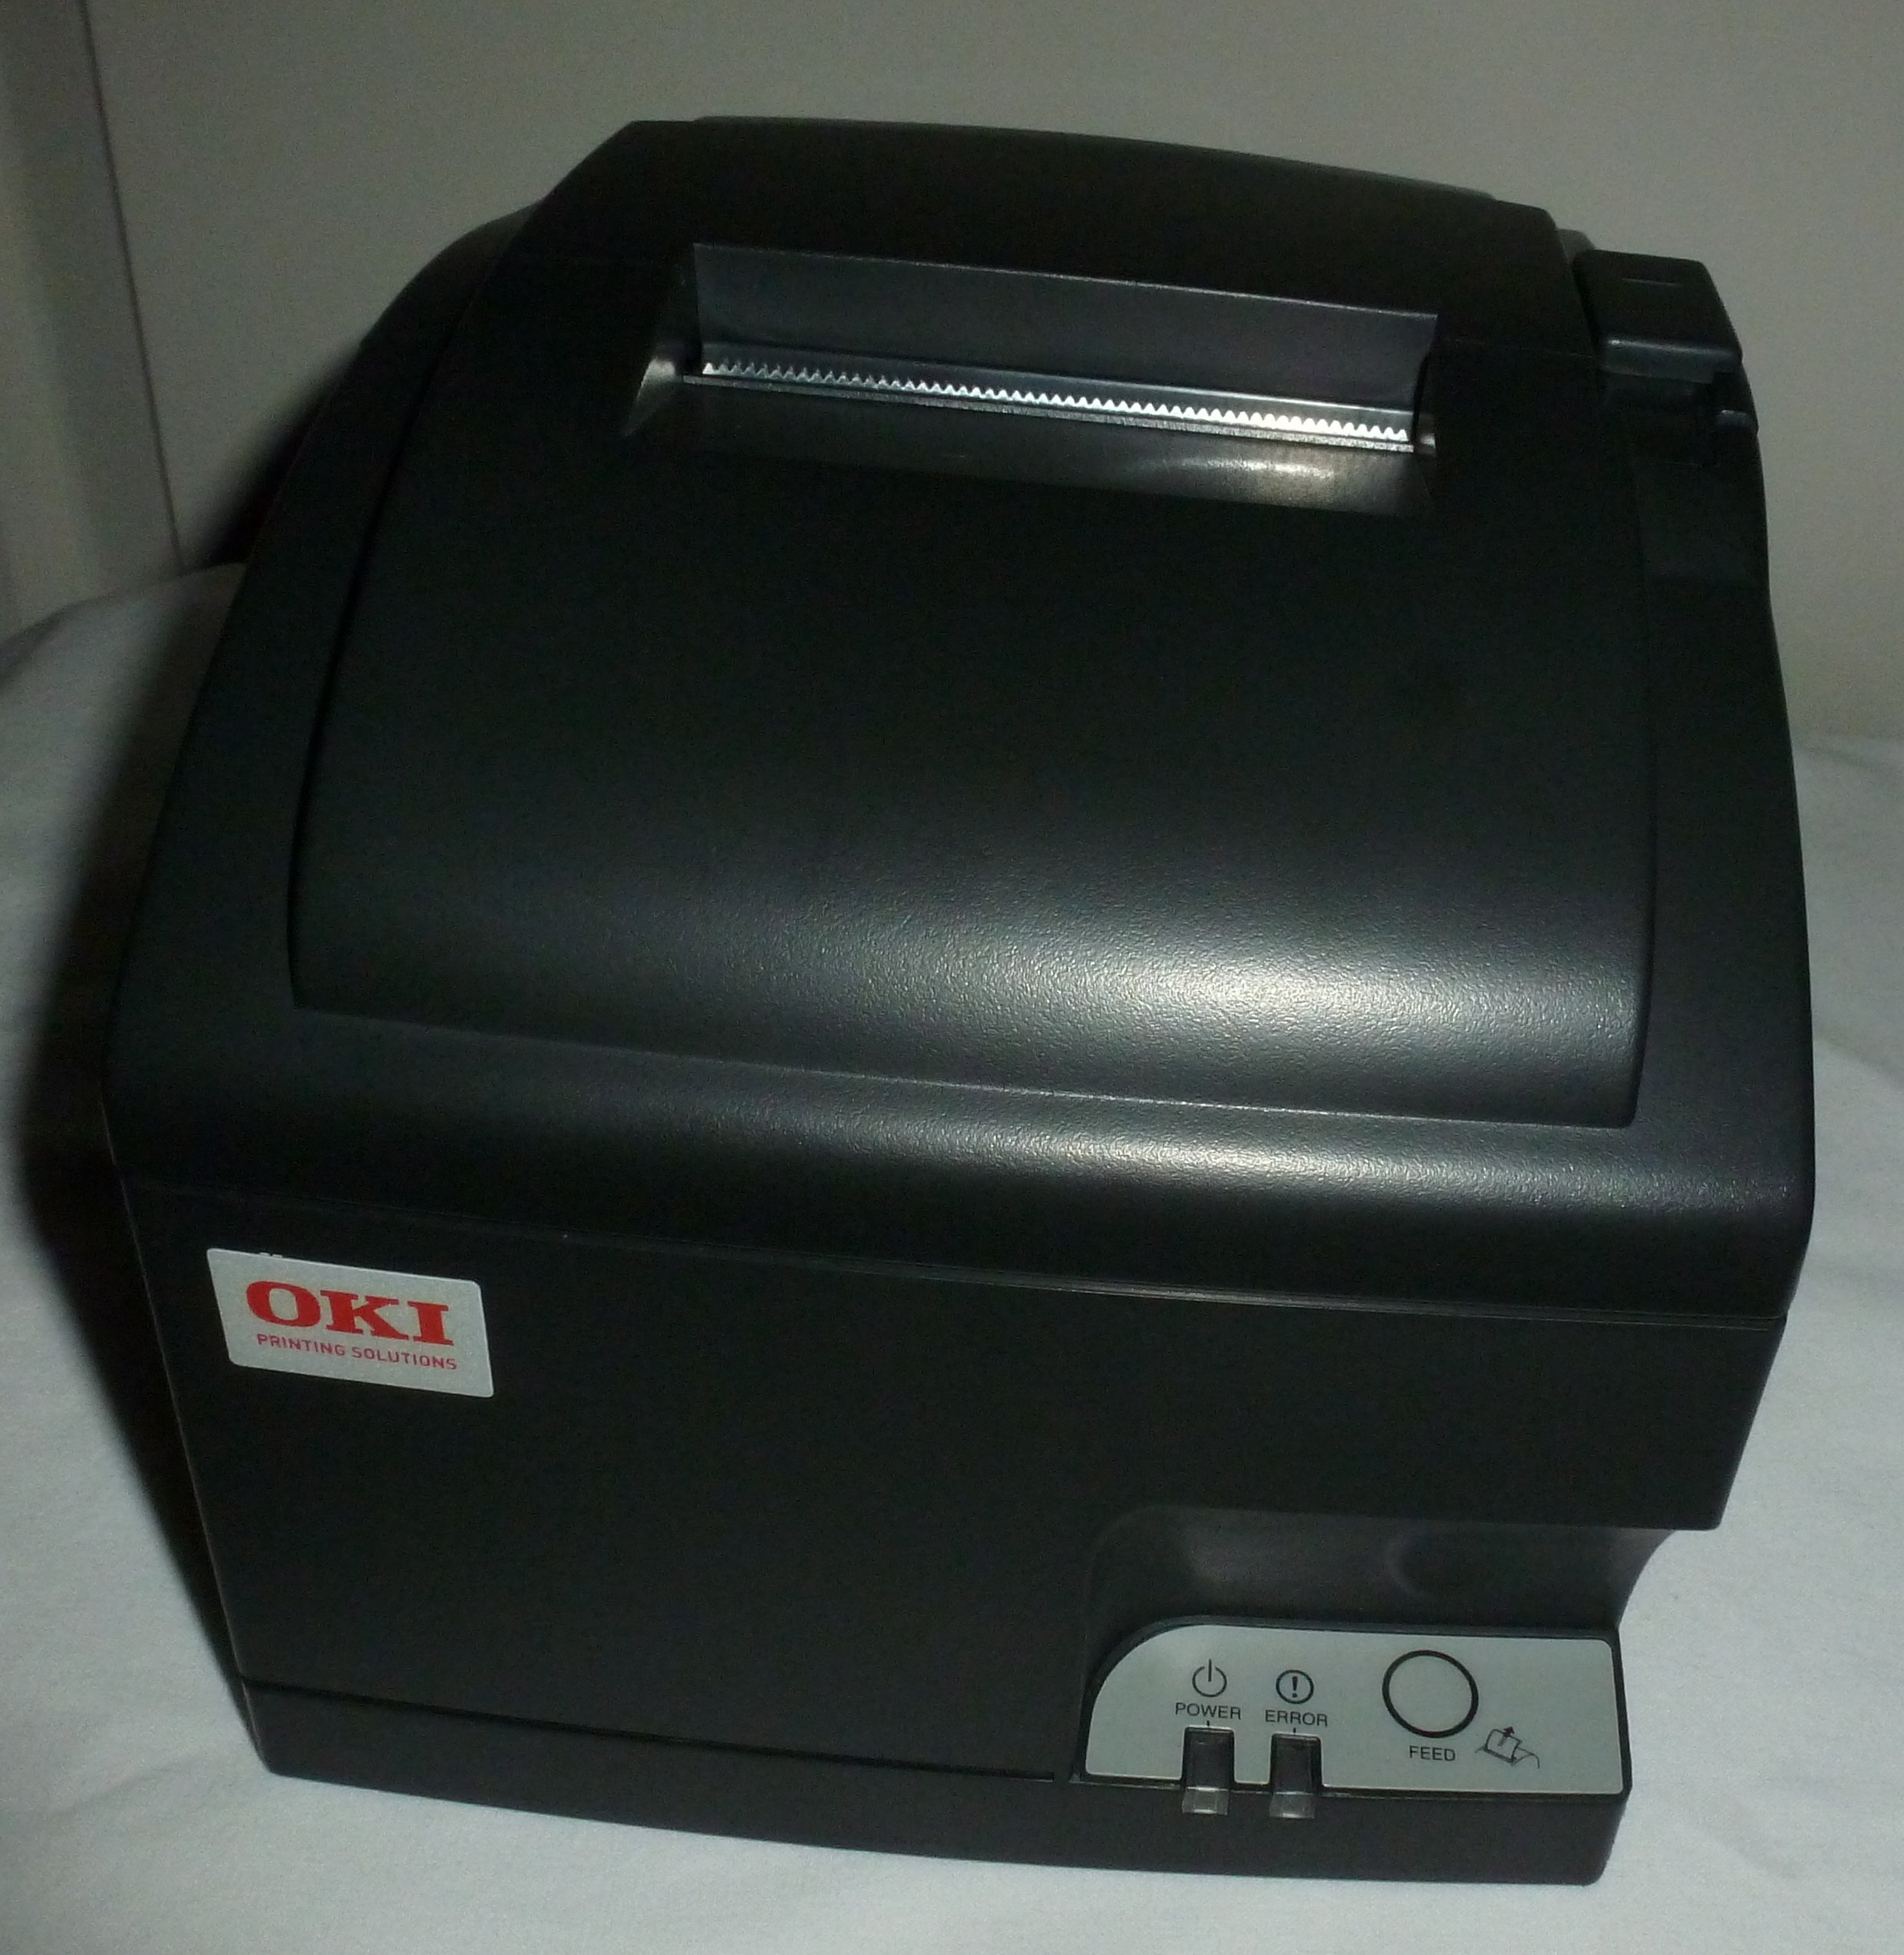 OKI Data OKIpos 441 Serial 9-Pin Dot Matrix Printer, Serial Port, No Auto-cutter, Charcoal